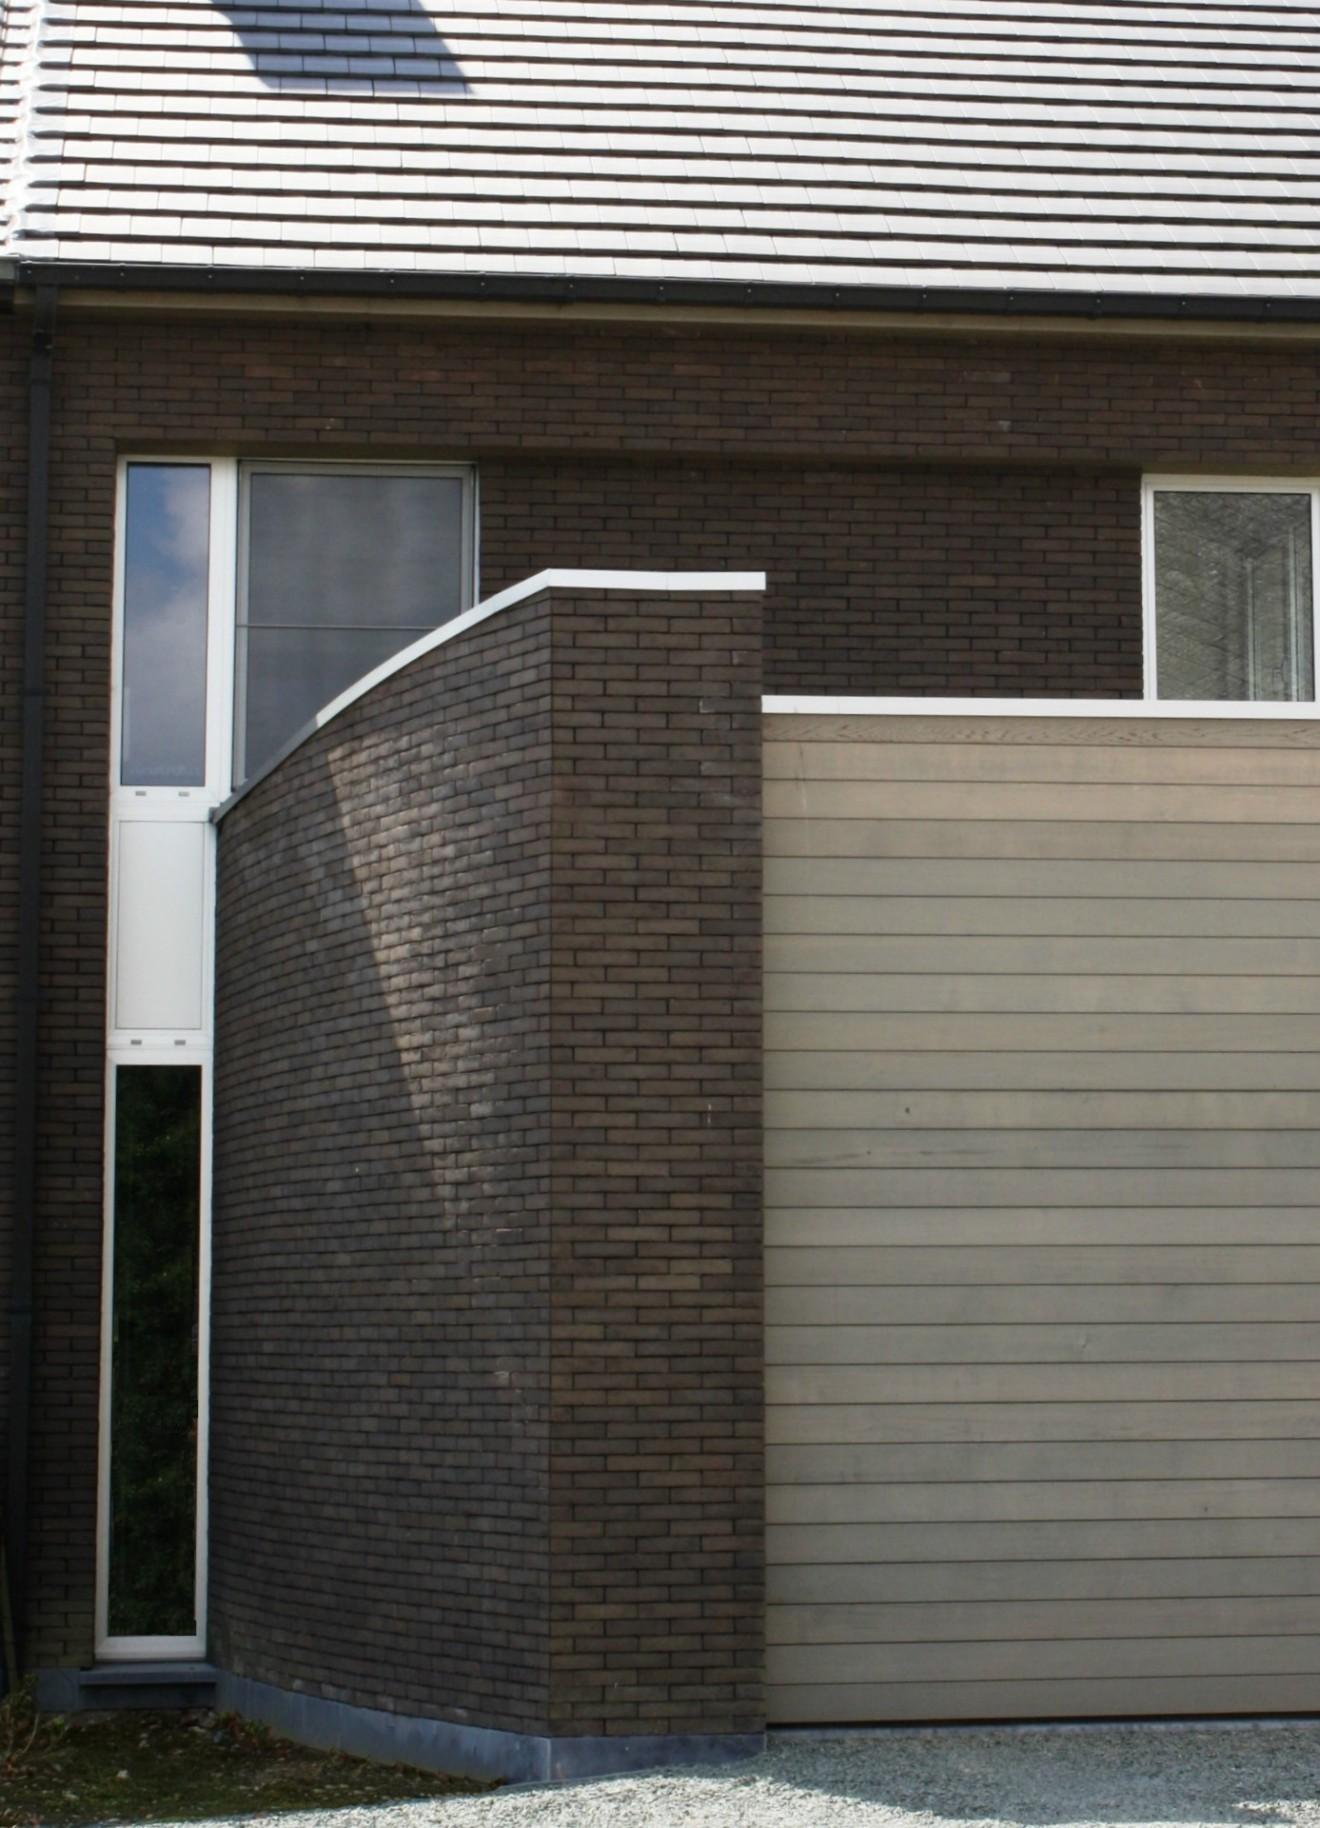 Architect- en ingenieursbureau Andries & Vuylsteke - Nieuwbouwwoning Hillegem Herzele